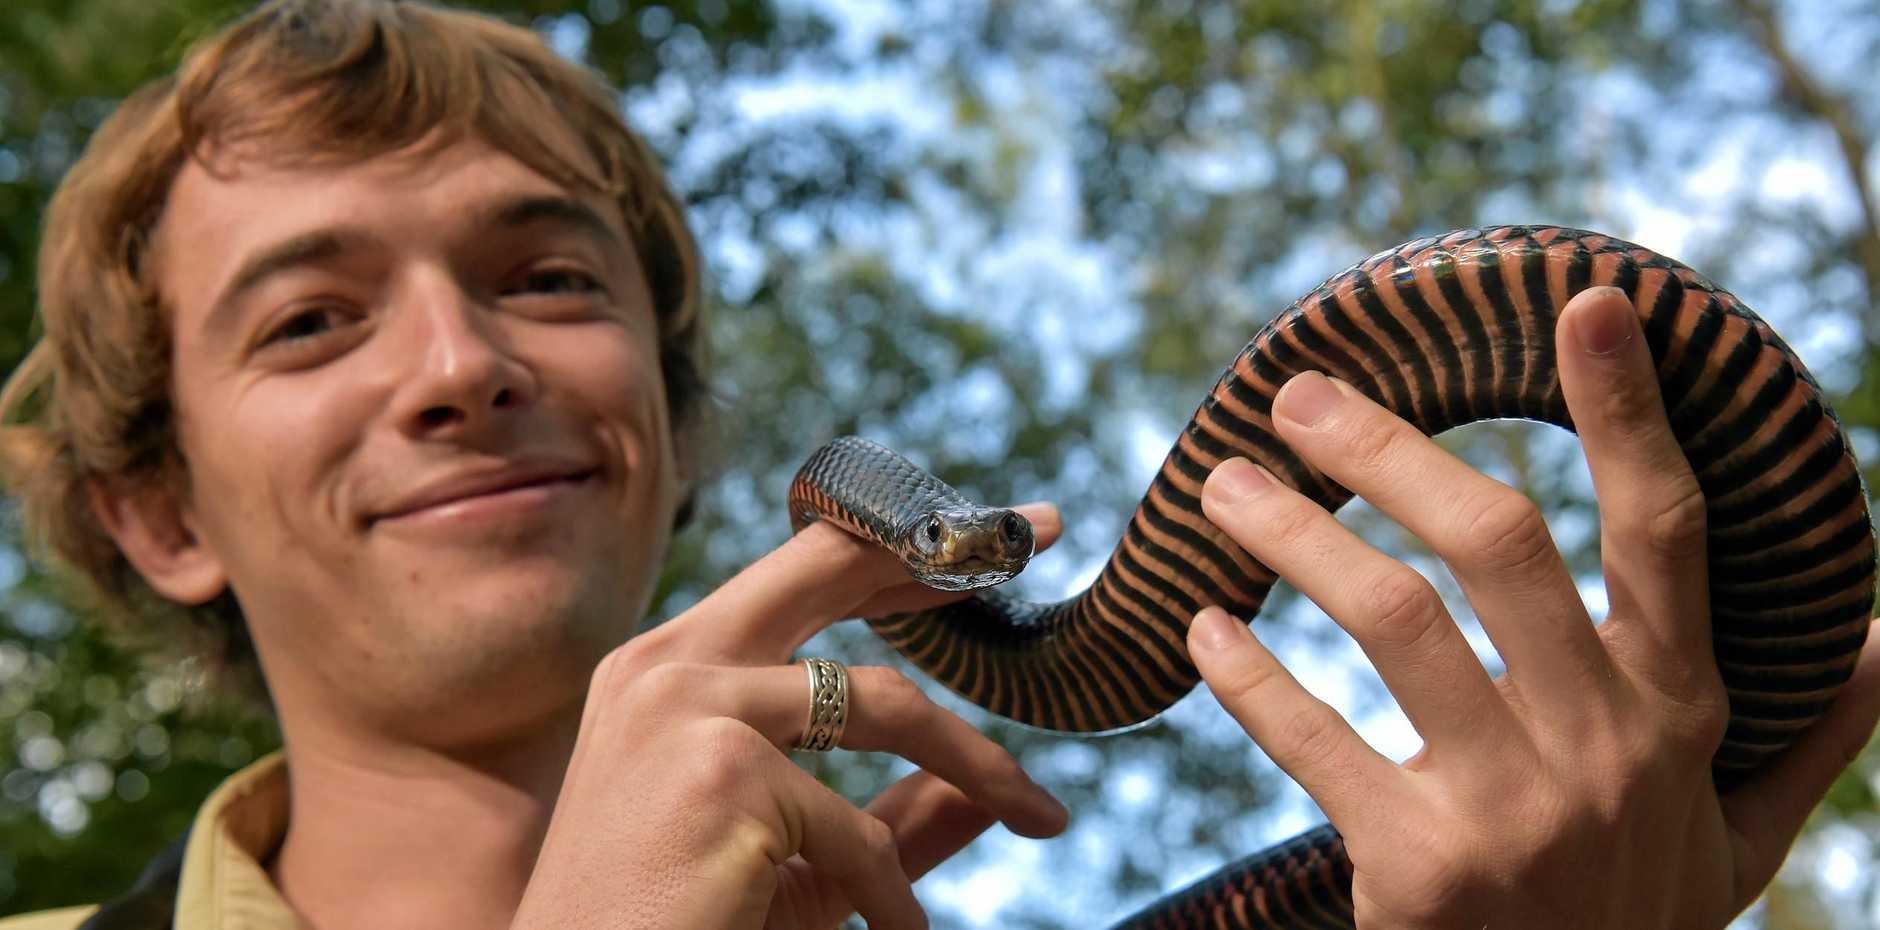 Noosa snake catcher Luke Huntley holding his pet red belly black snake, Russell.